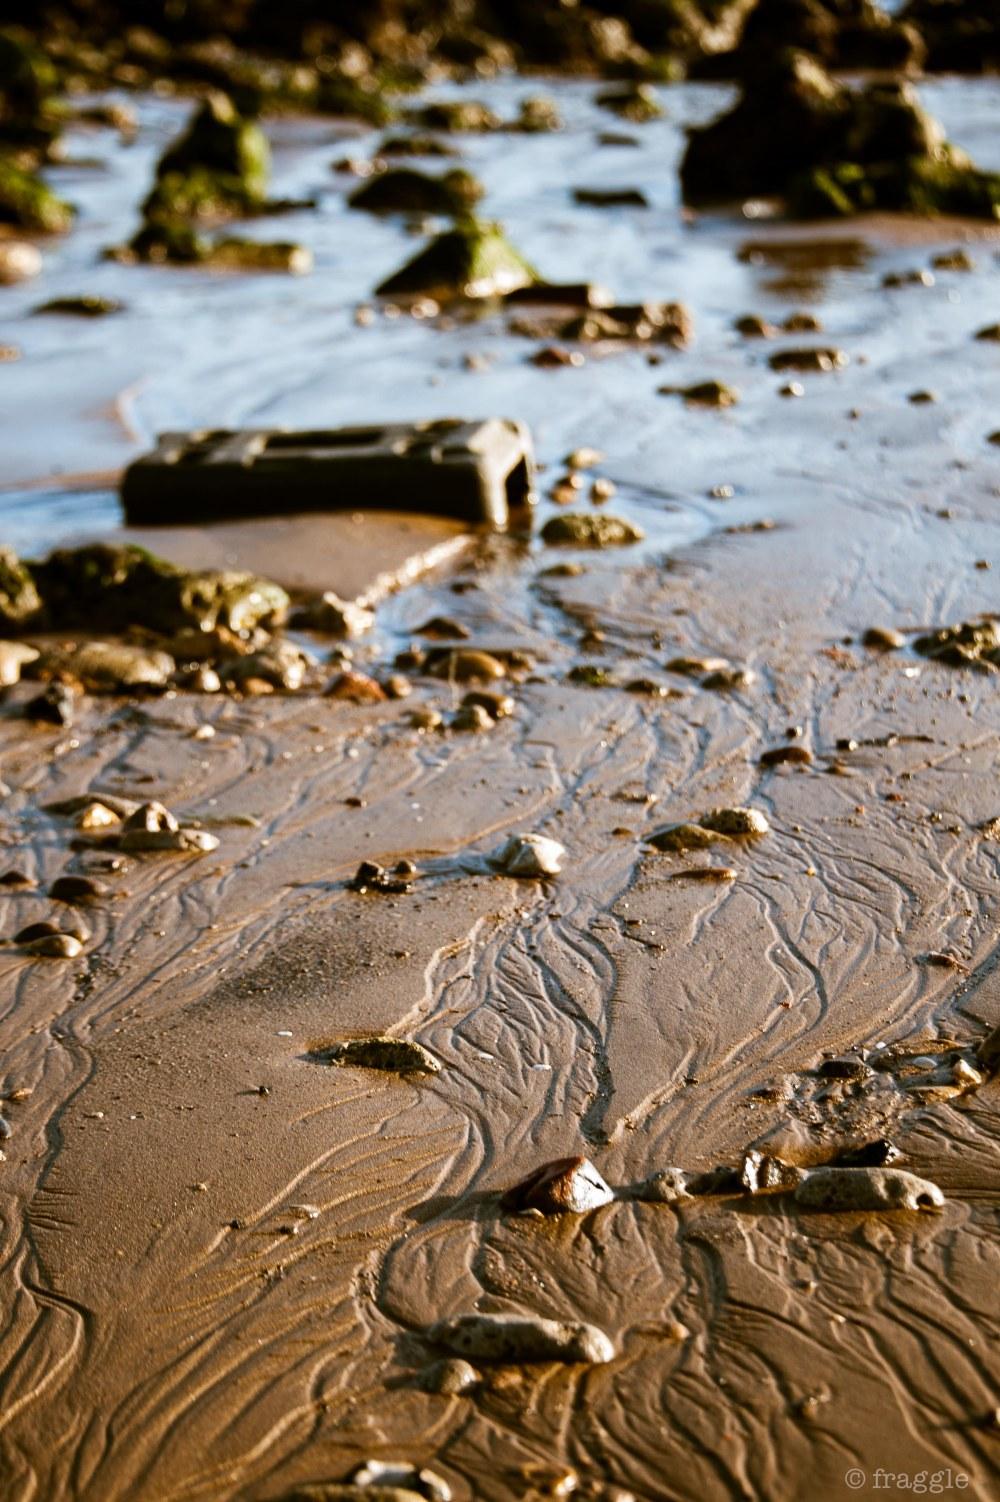 wiggley sand~Nikon D700